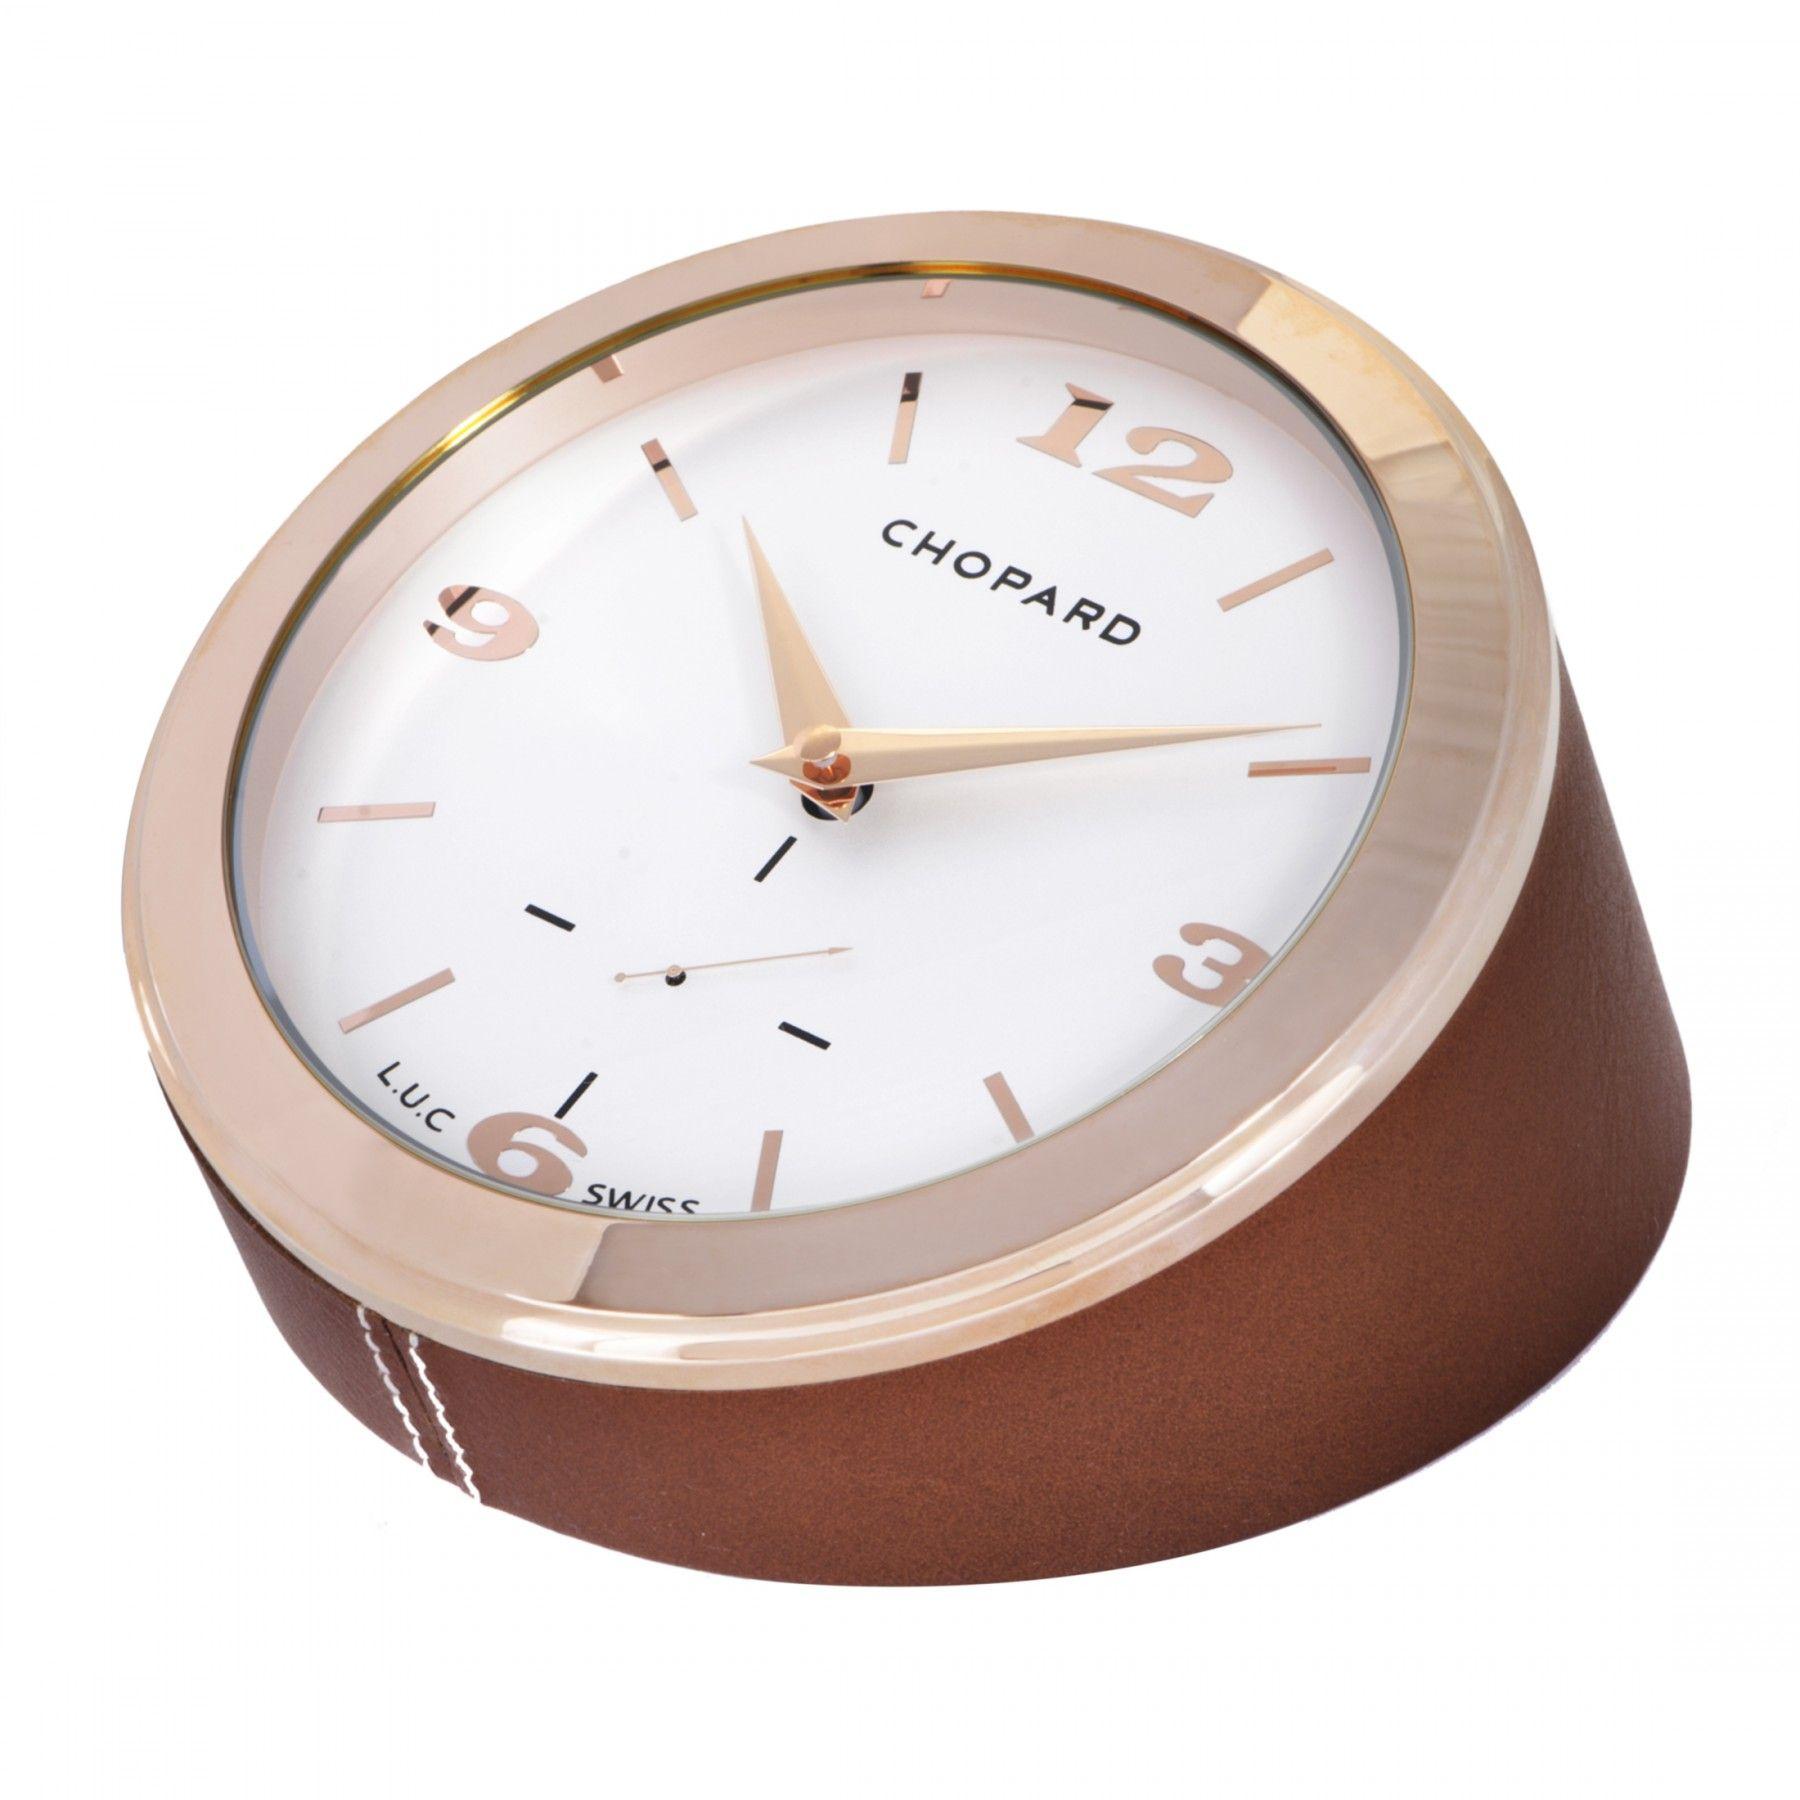 L.U.C. Table Clock 95020-0072